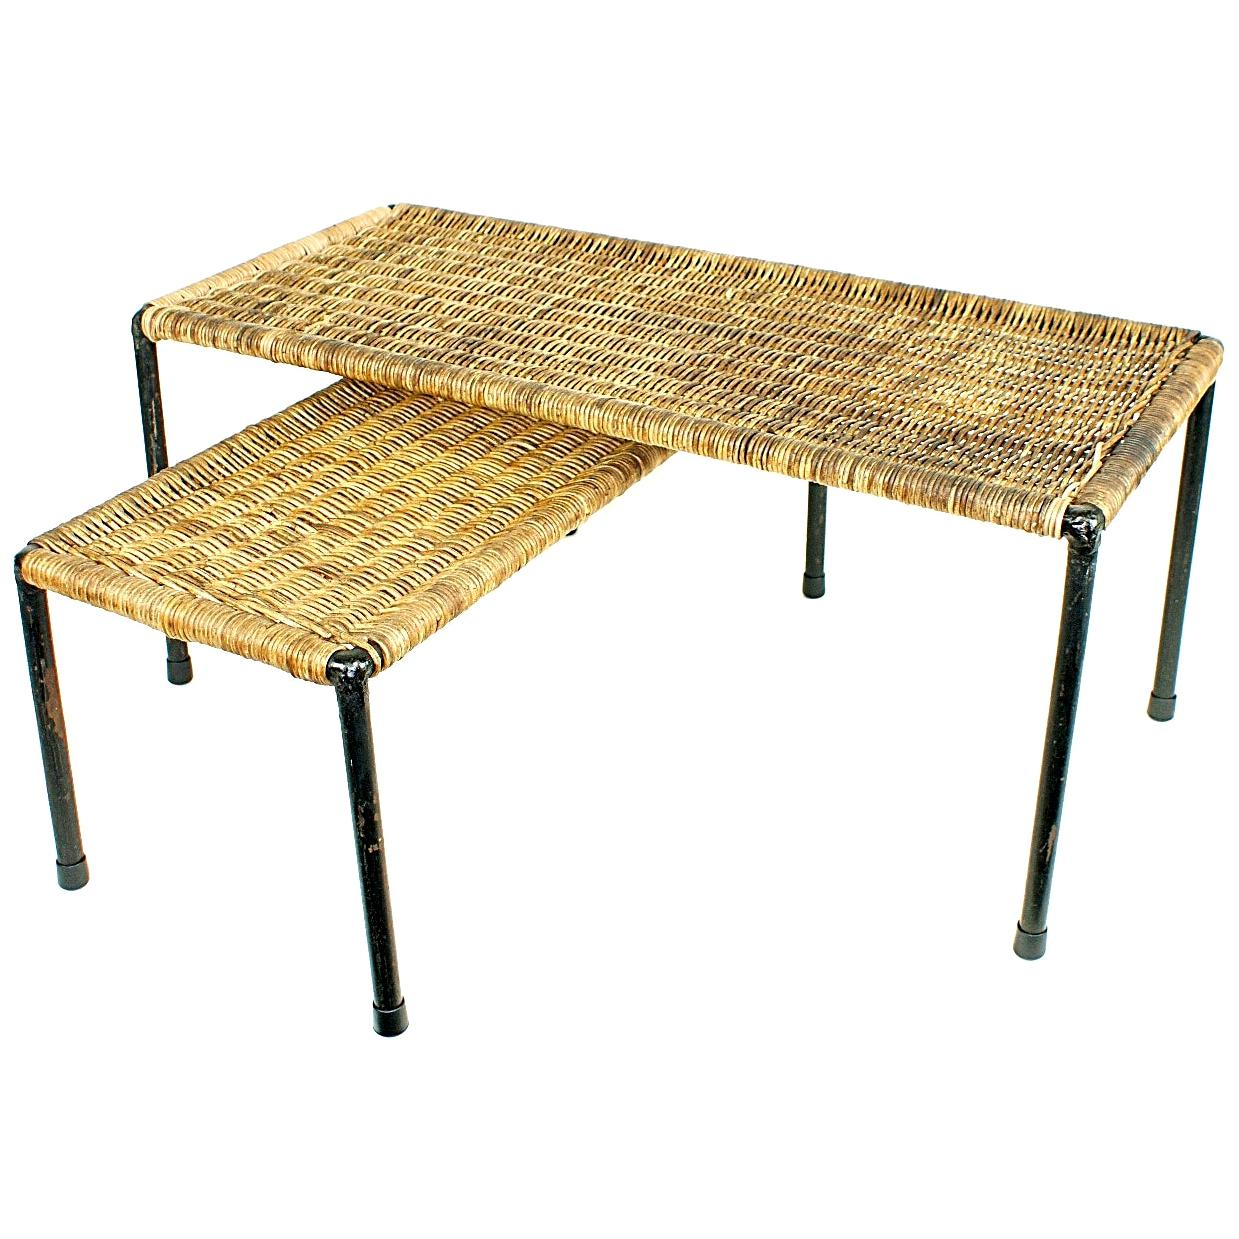 Pair of Midcentury Carl Auböck Rattan Top Side Table, 1950s, Austria